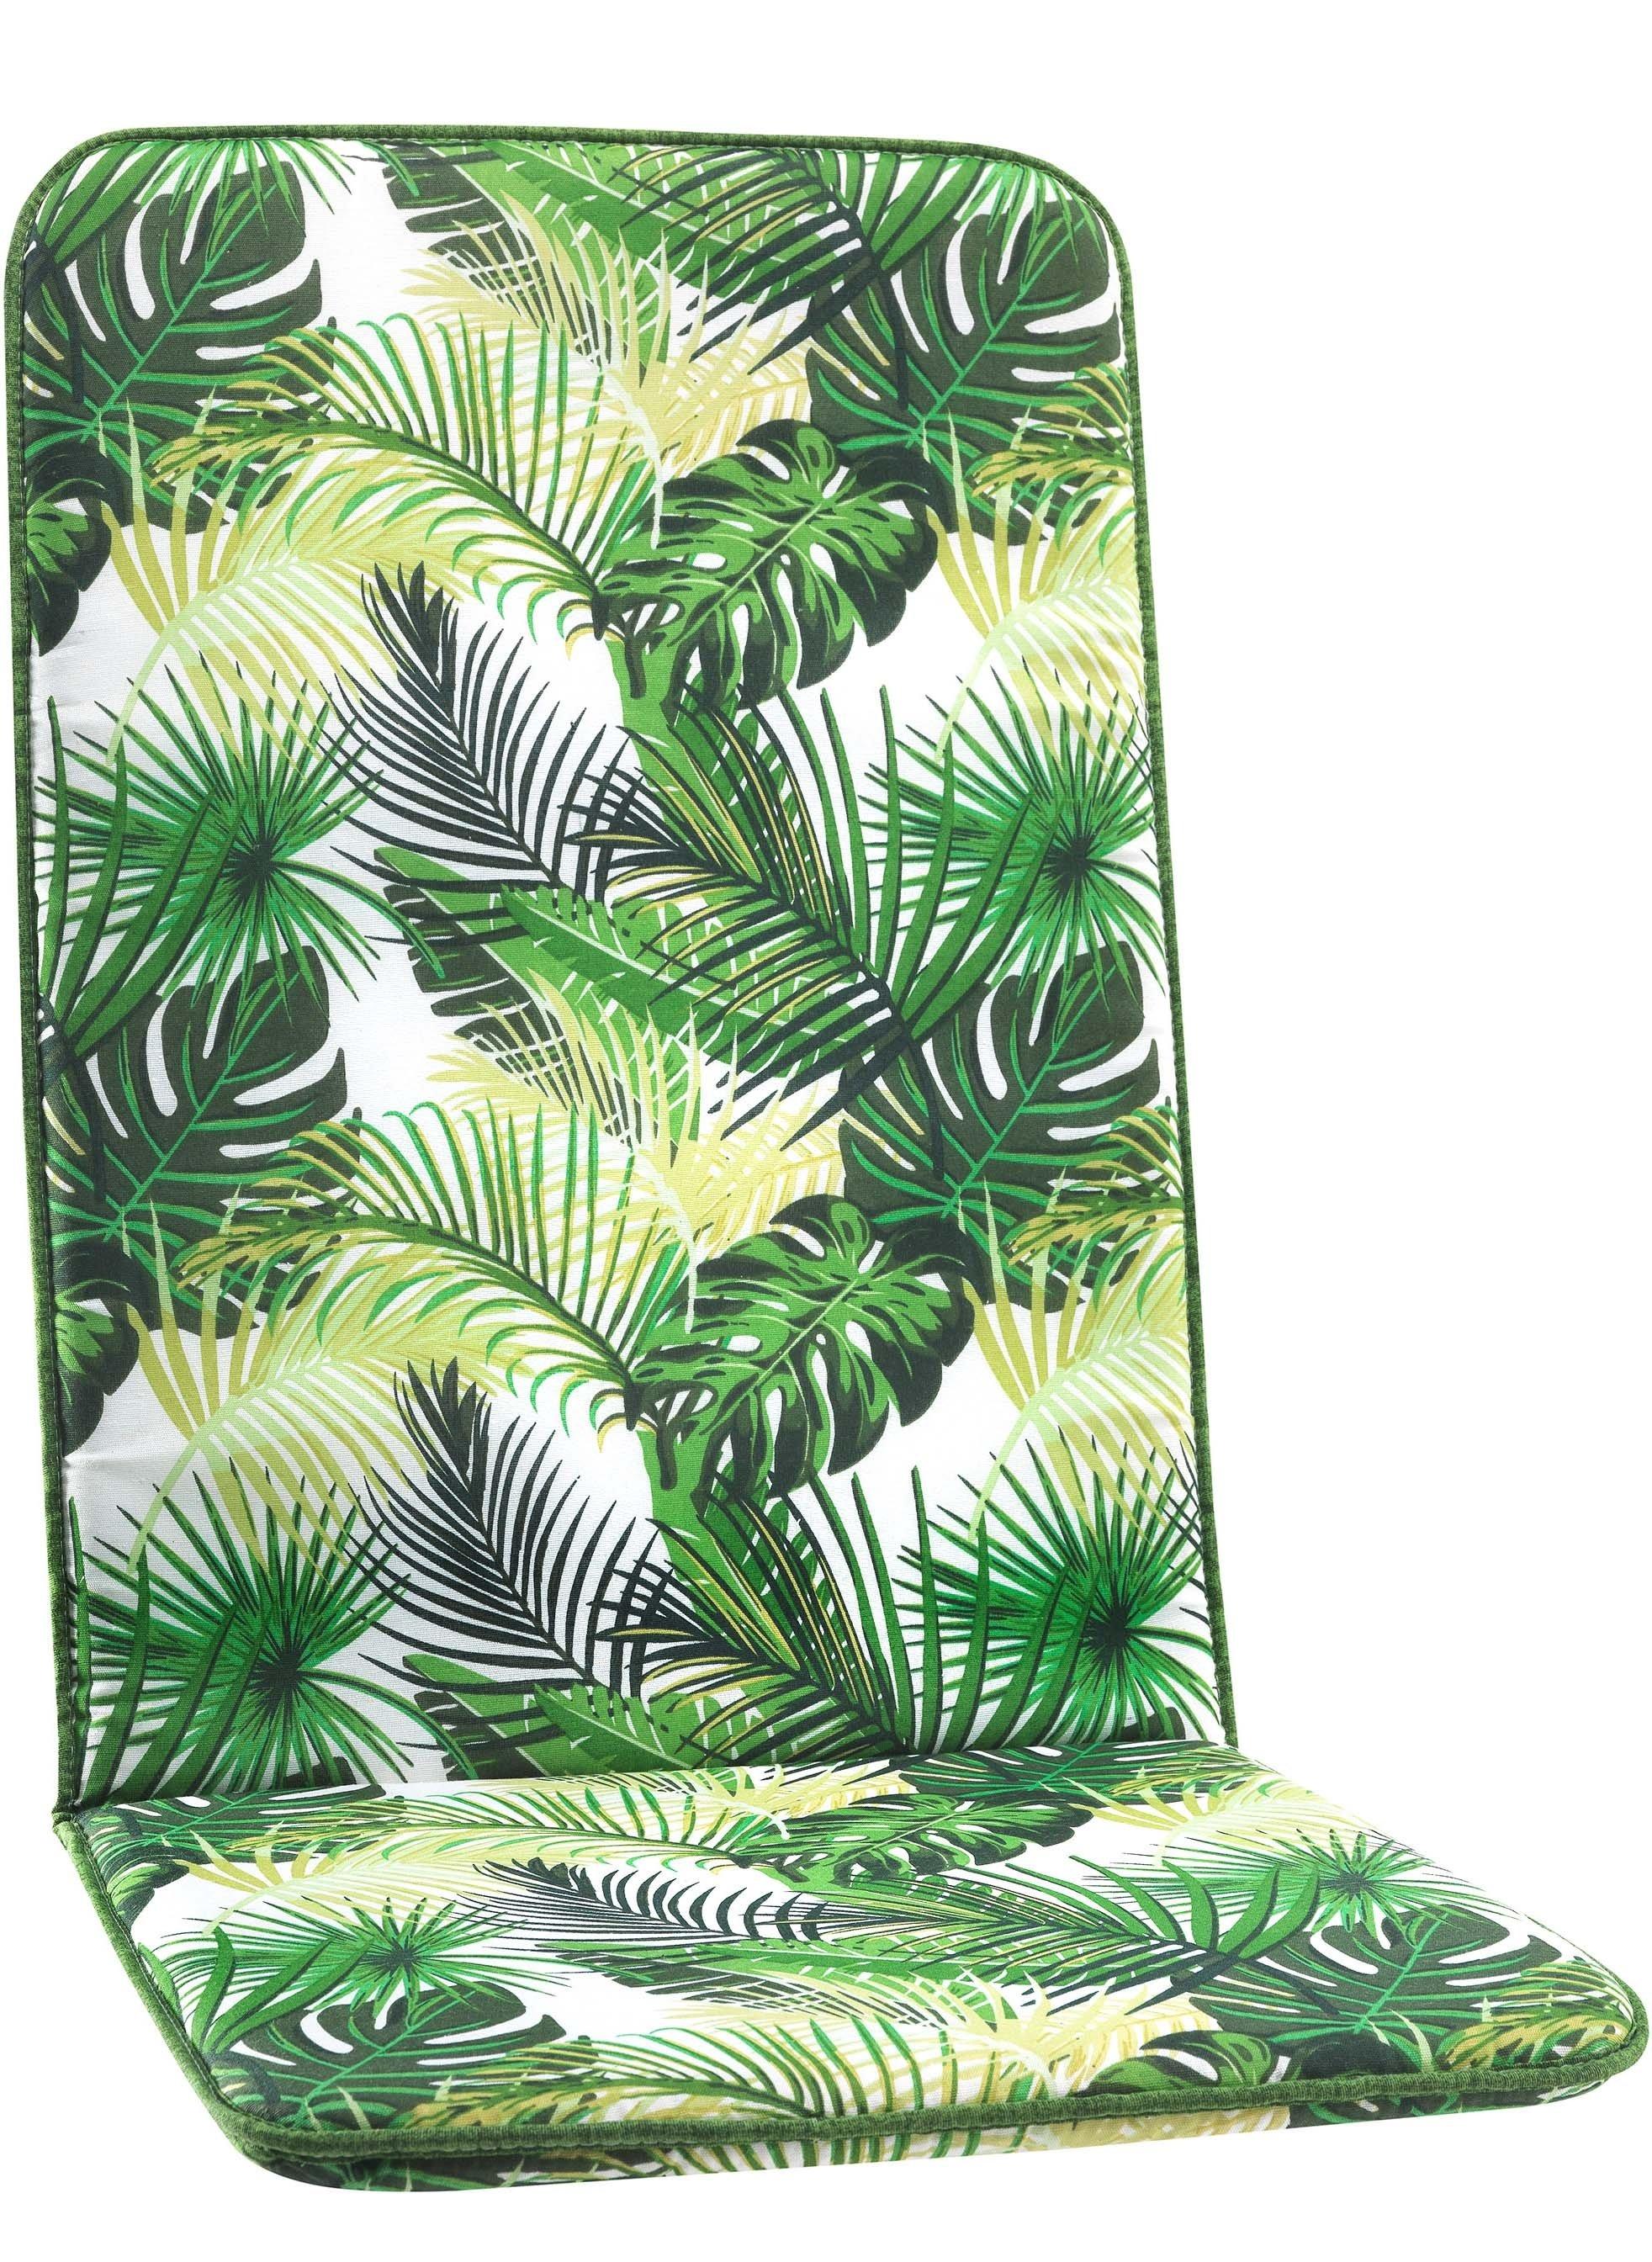 polster f r hochlehner garten haushalt. Black Bedroom Furniture Sets. Home Design Ideas